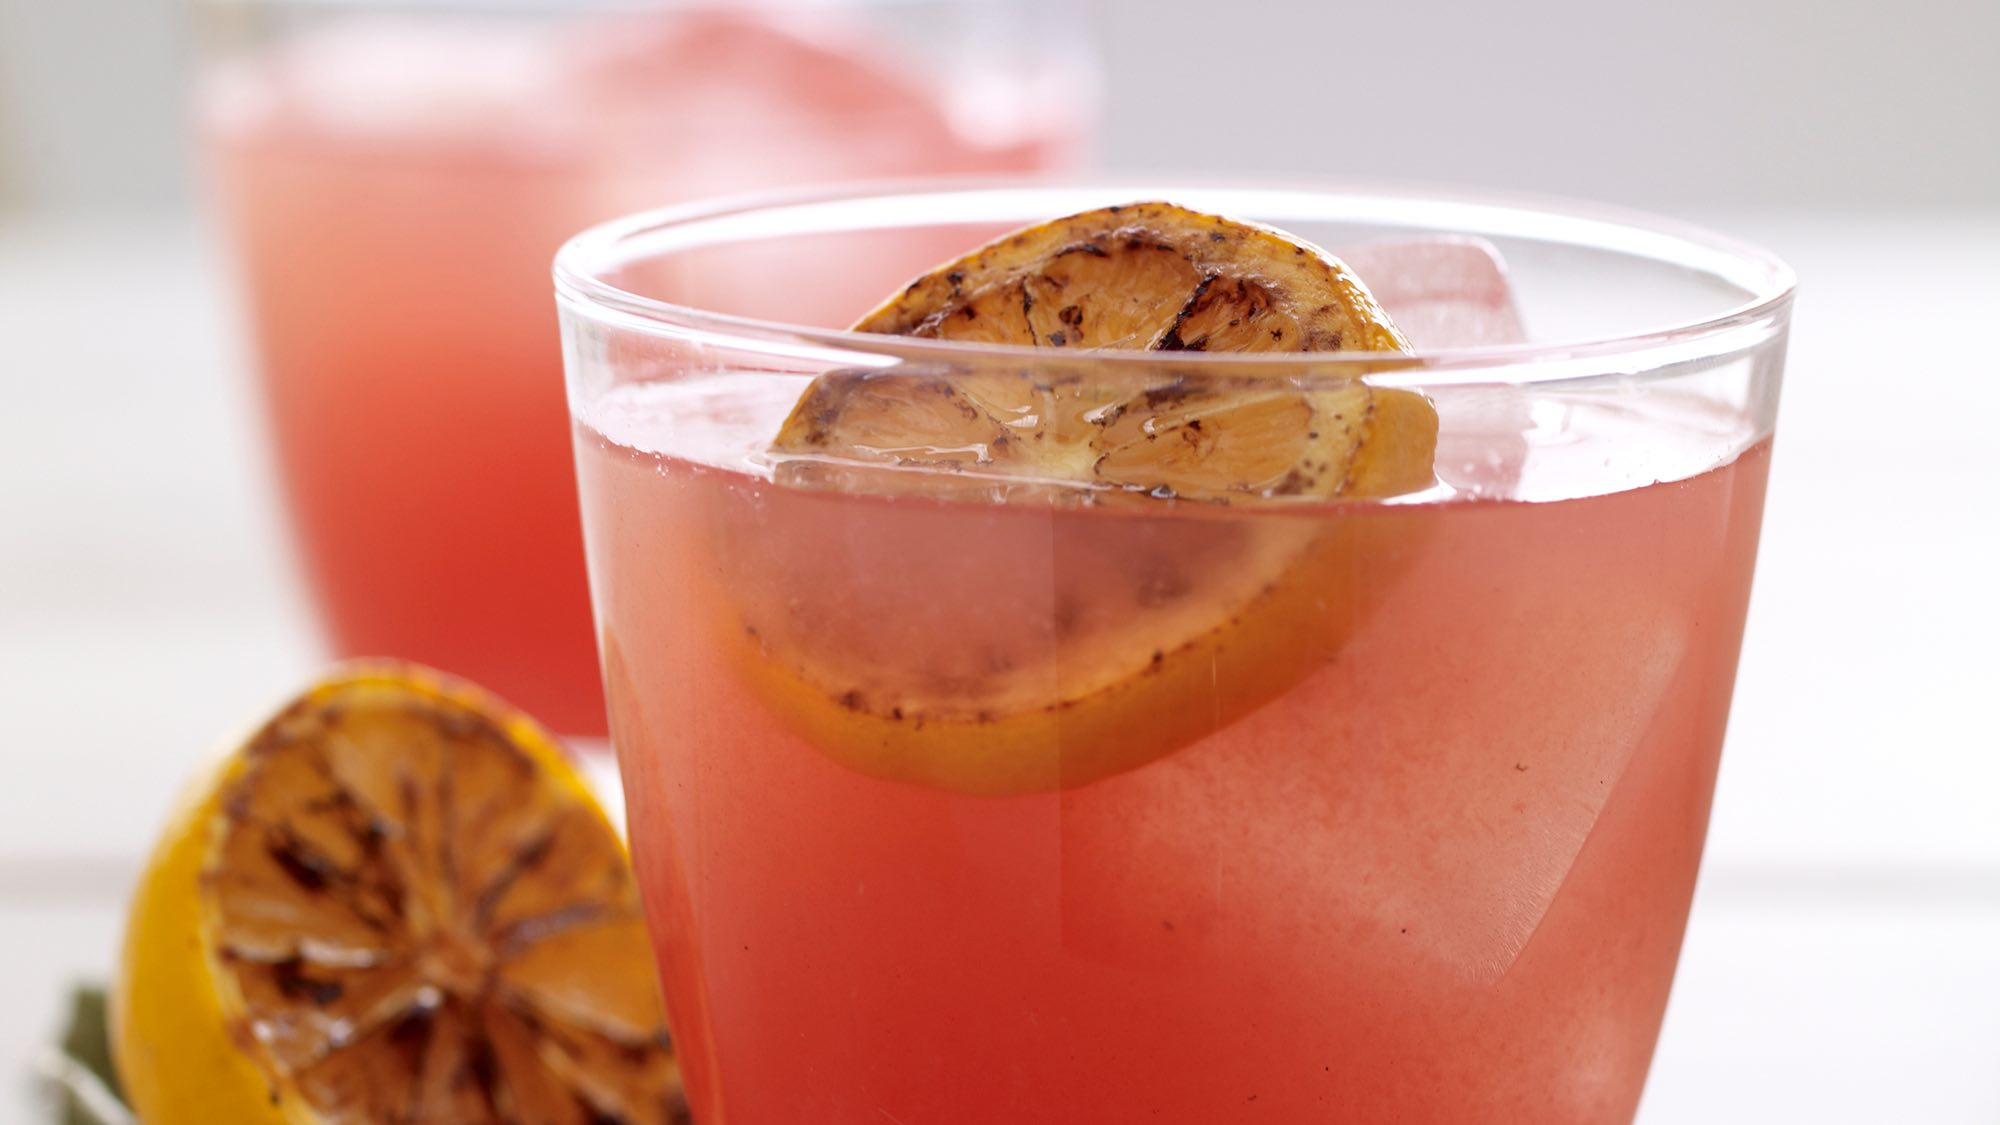 McCormick Fresh Lemonade with Grilled Lemons & Watermelon